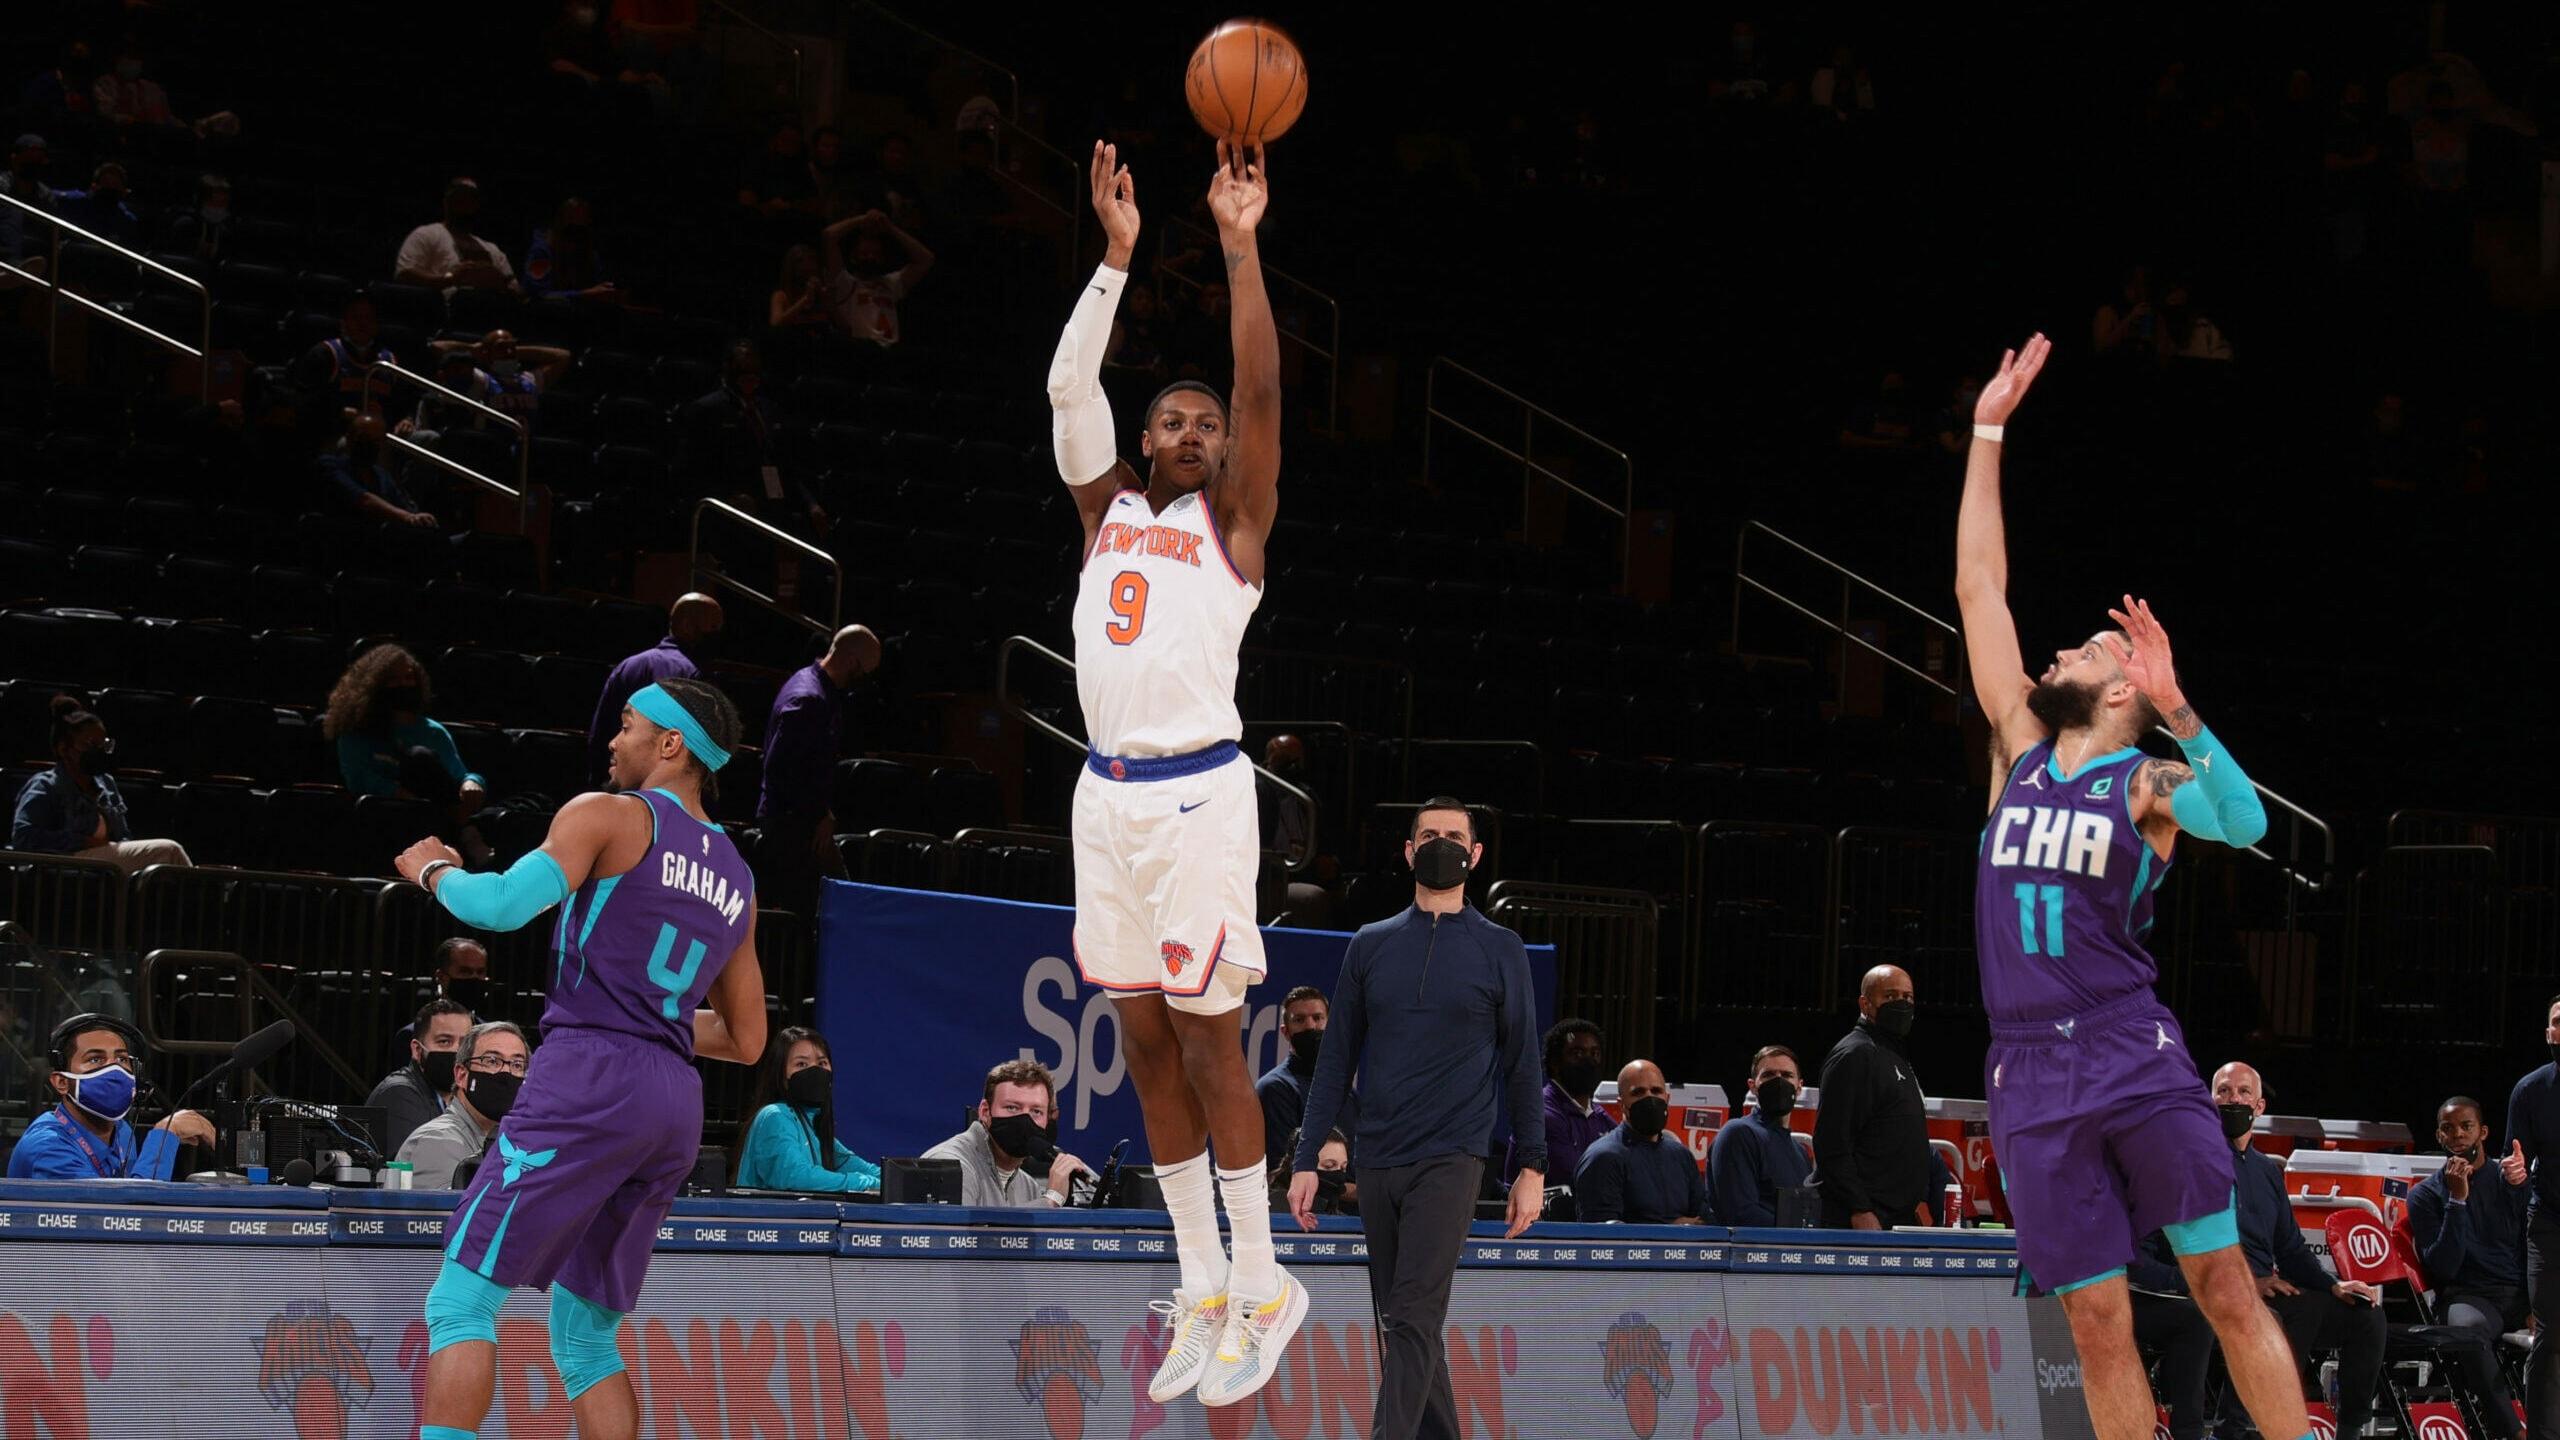 Barrett shines as Knicks get 7th straight win